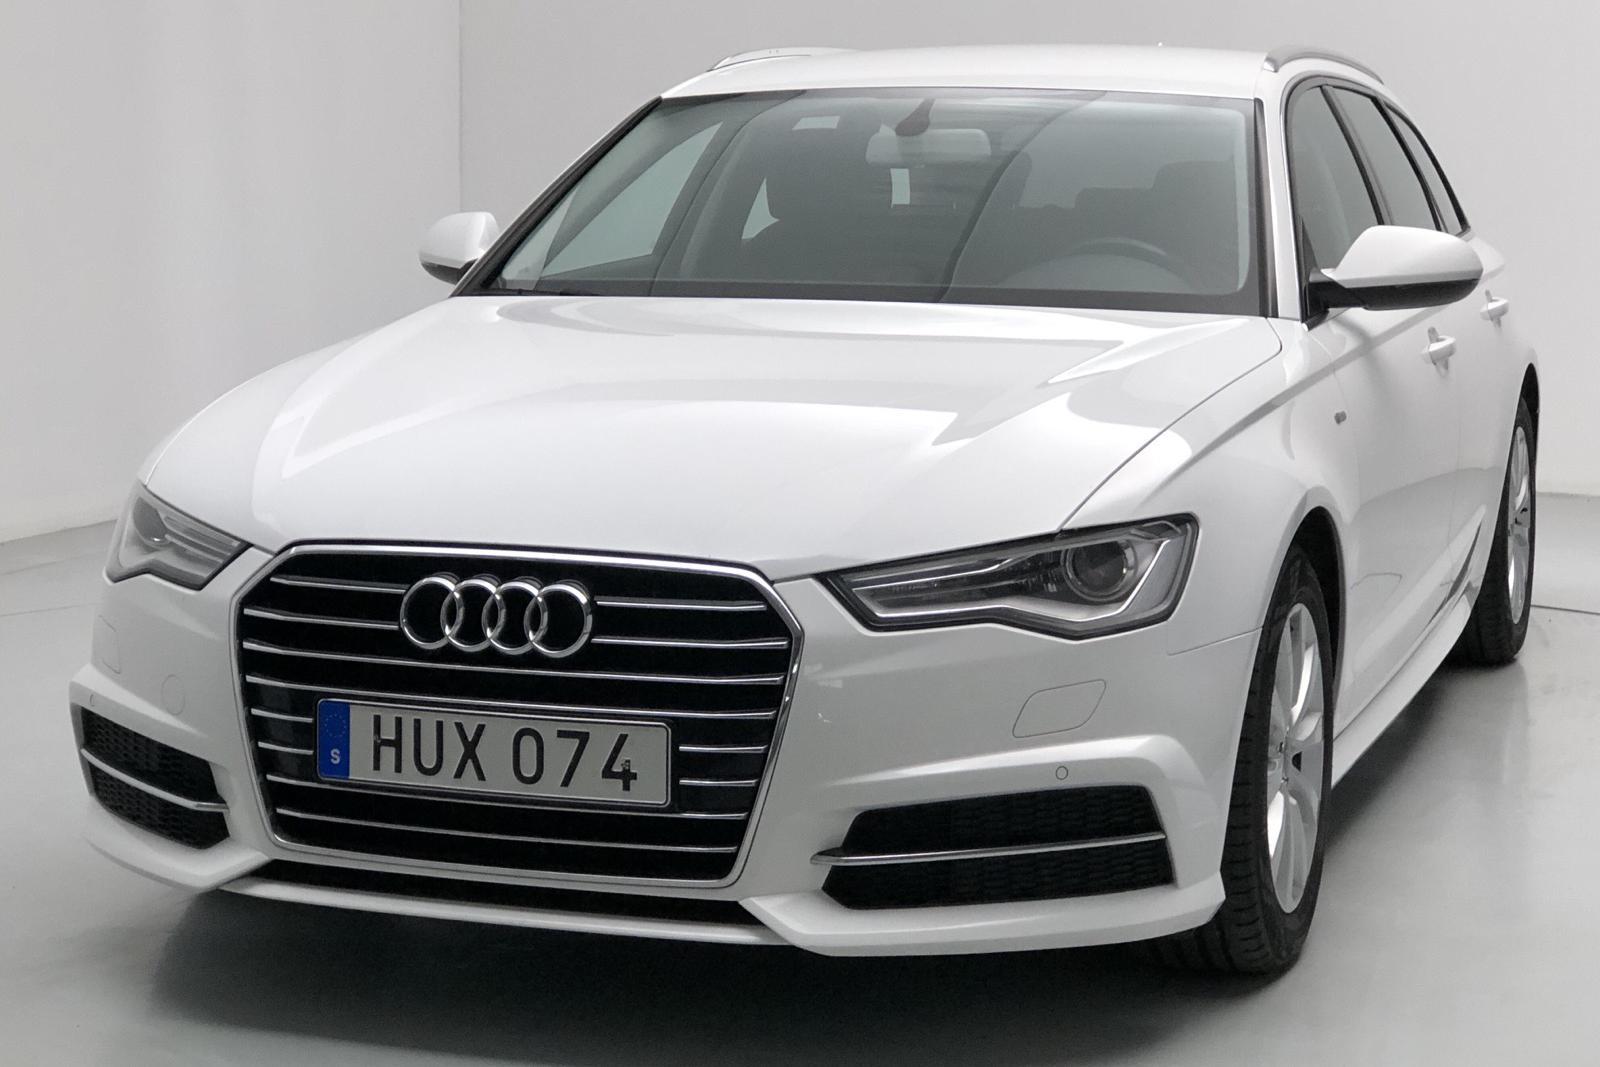 Audi A6 2.0 TDI Avant (190hk) - 84 000 km - Manual - white - 2016